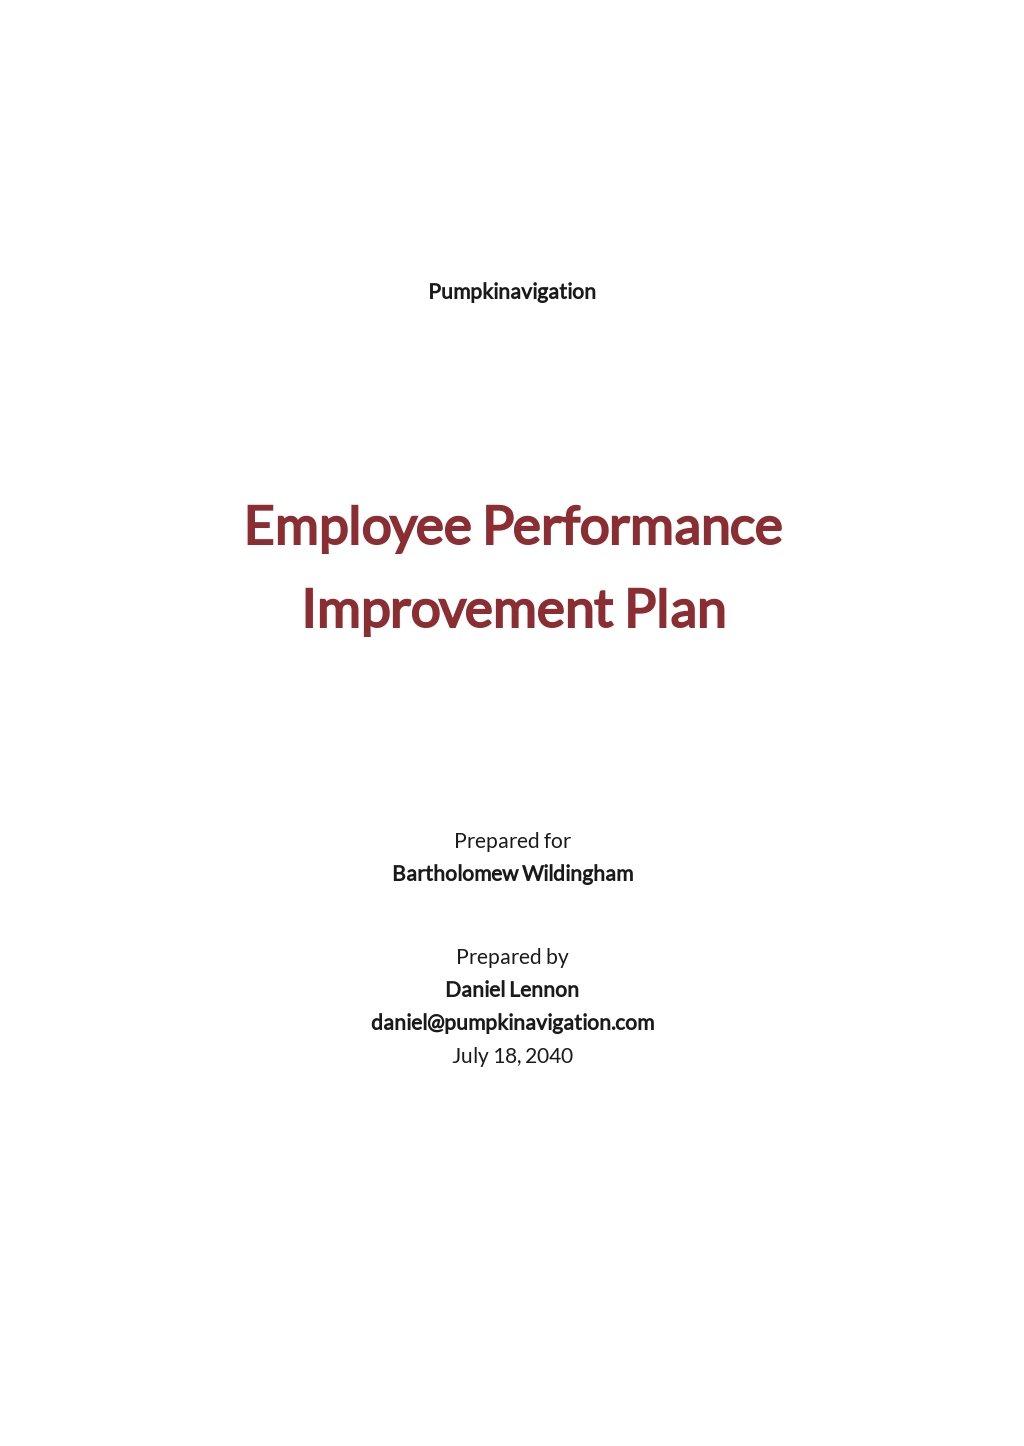 Employee Performance Improvement Plan Template.jpe